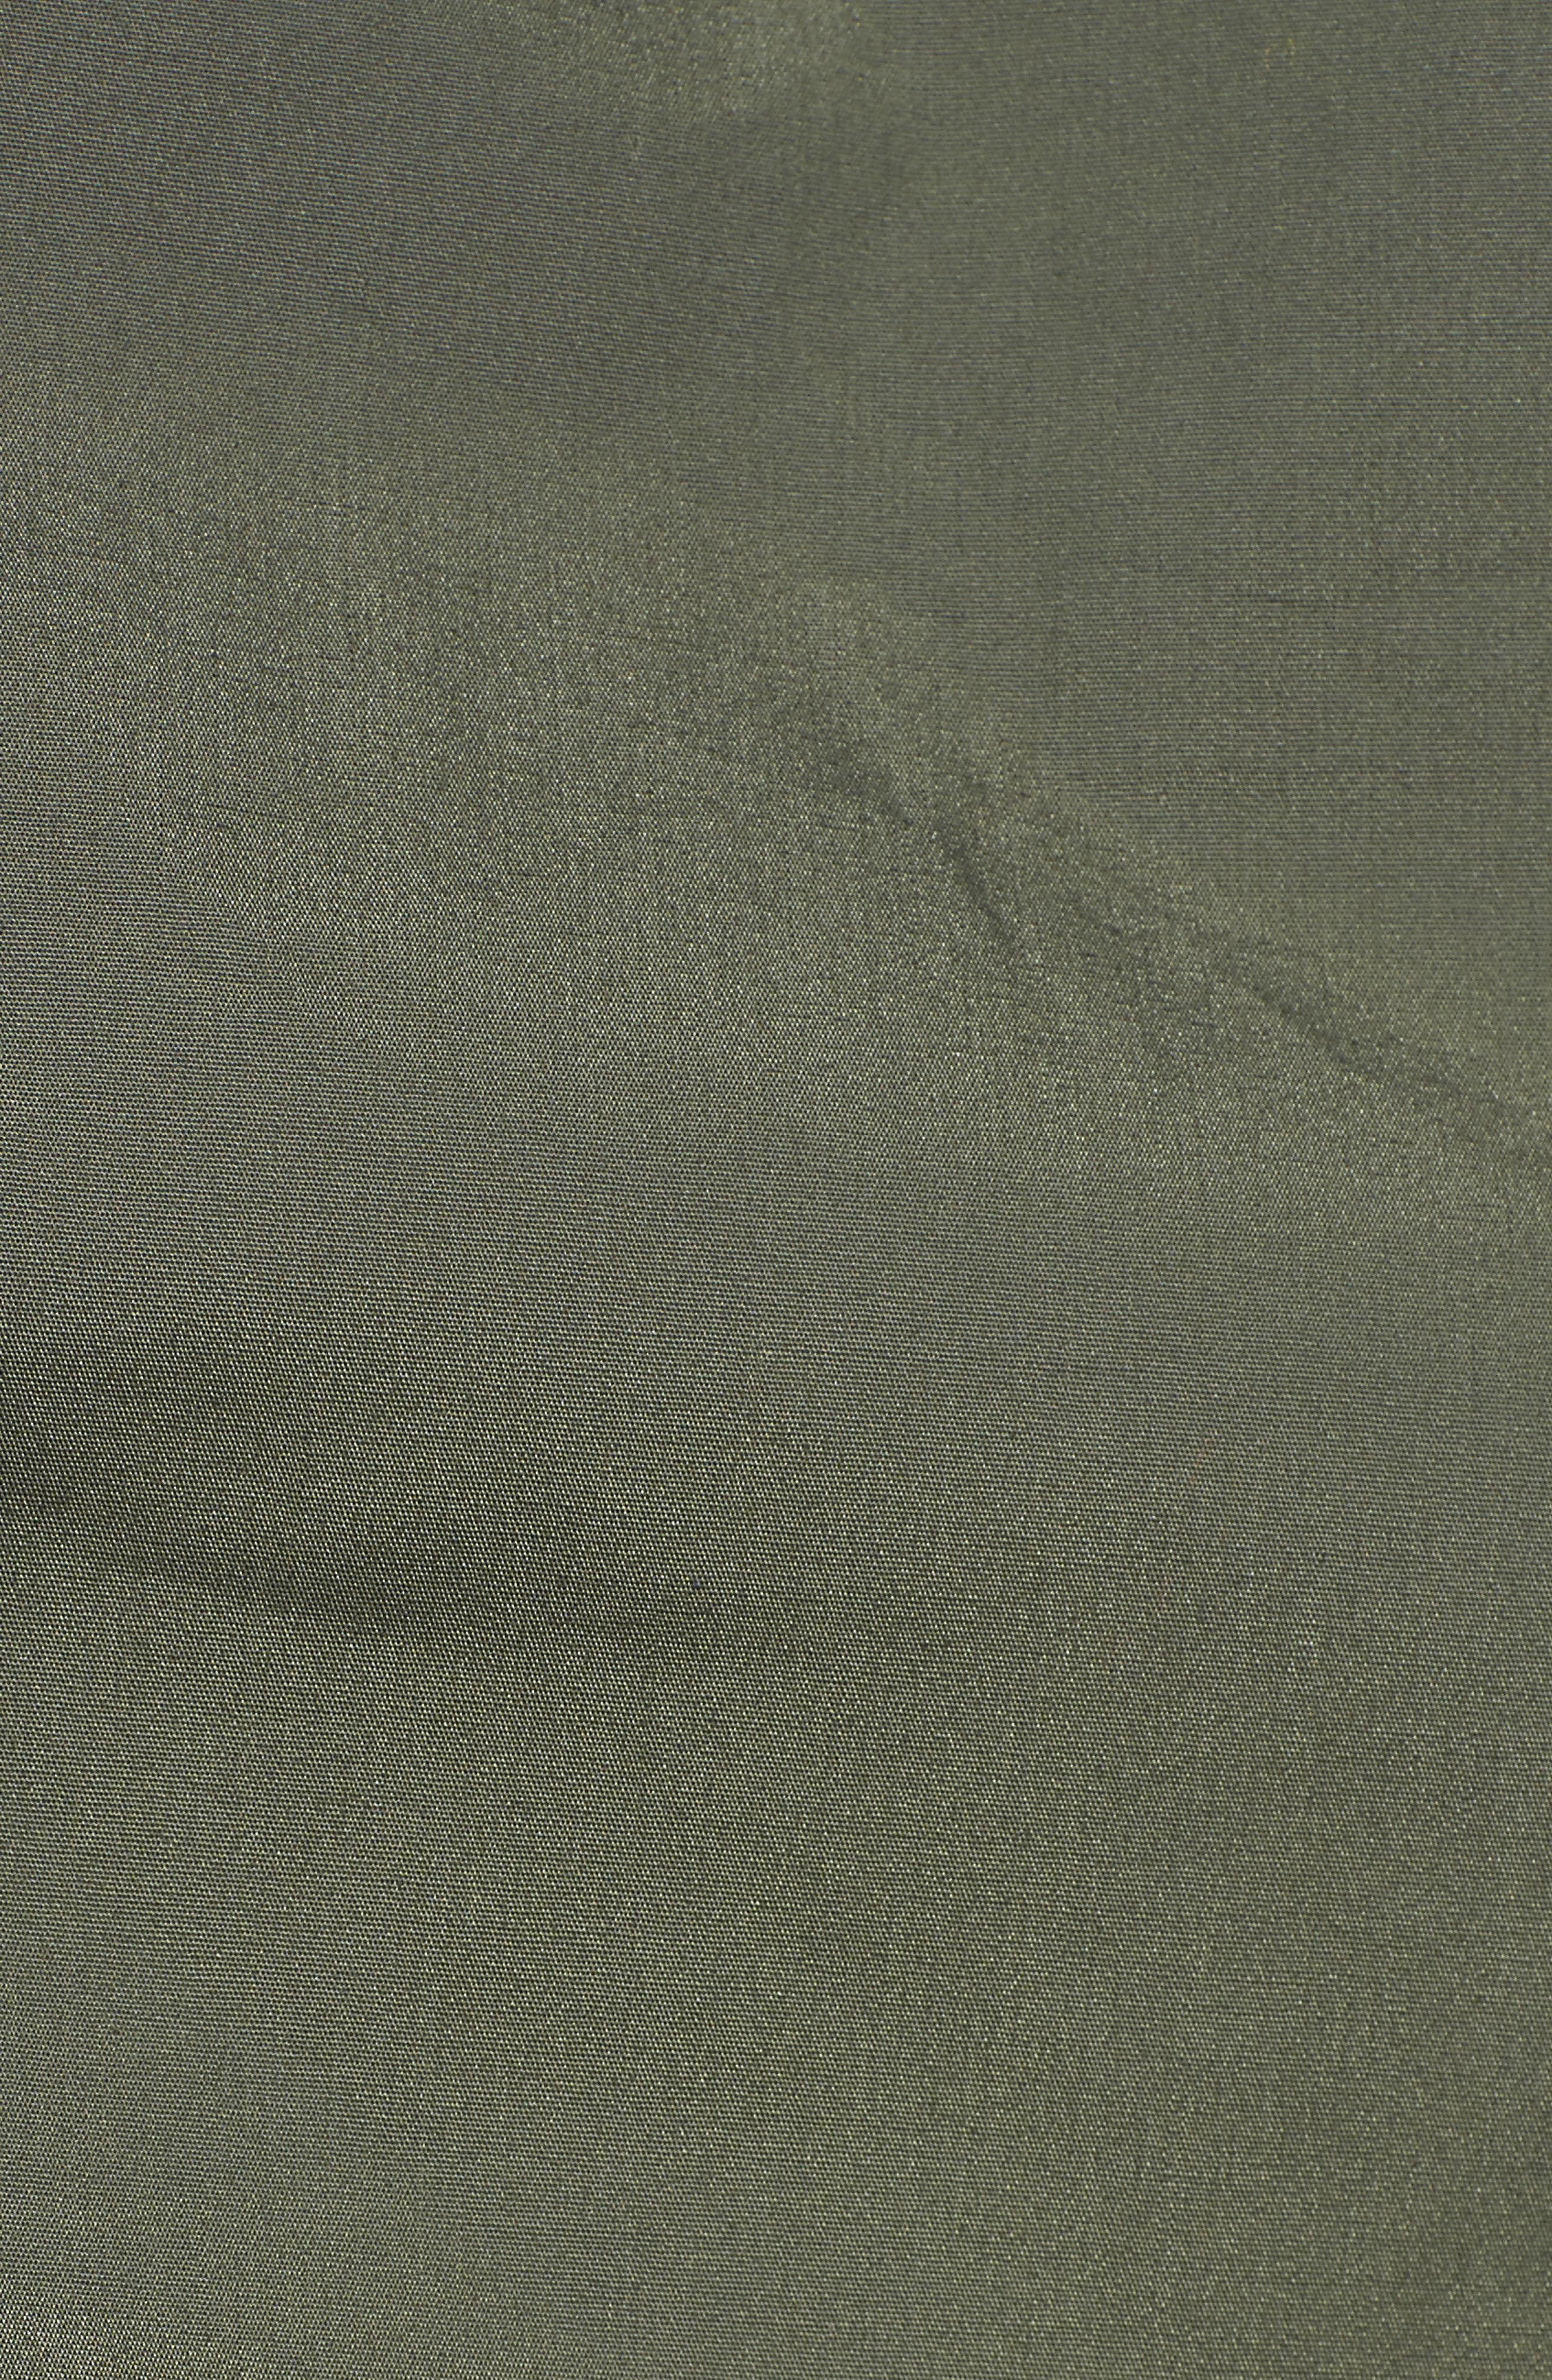 M-47 Faux Shearling Reversible Jacket,                             Alternate thumbnail 6, color,                             M-65 OLIVE